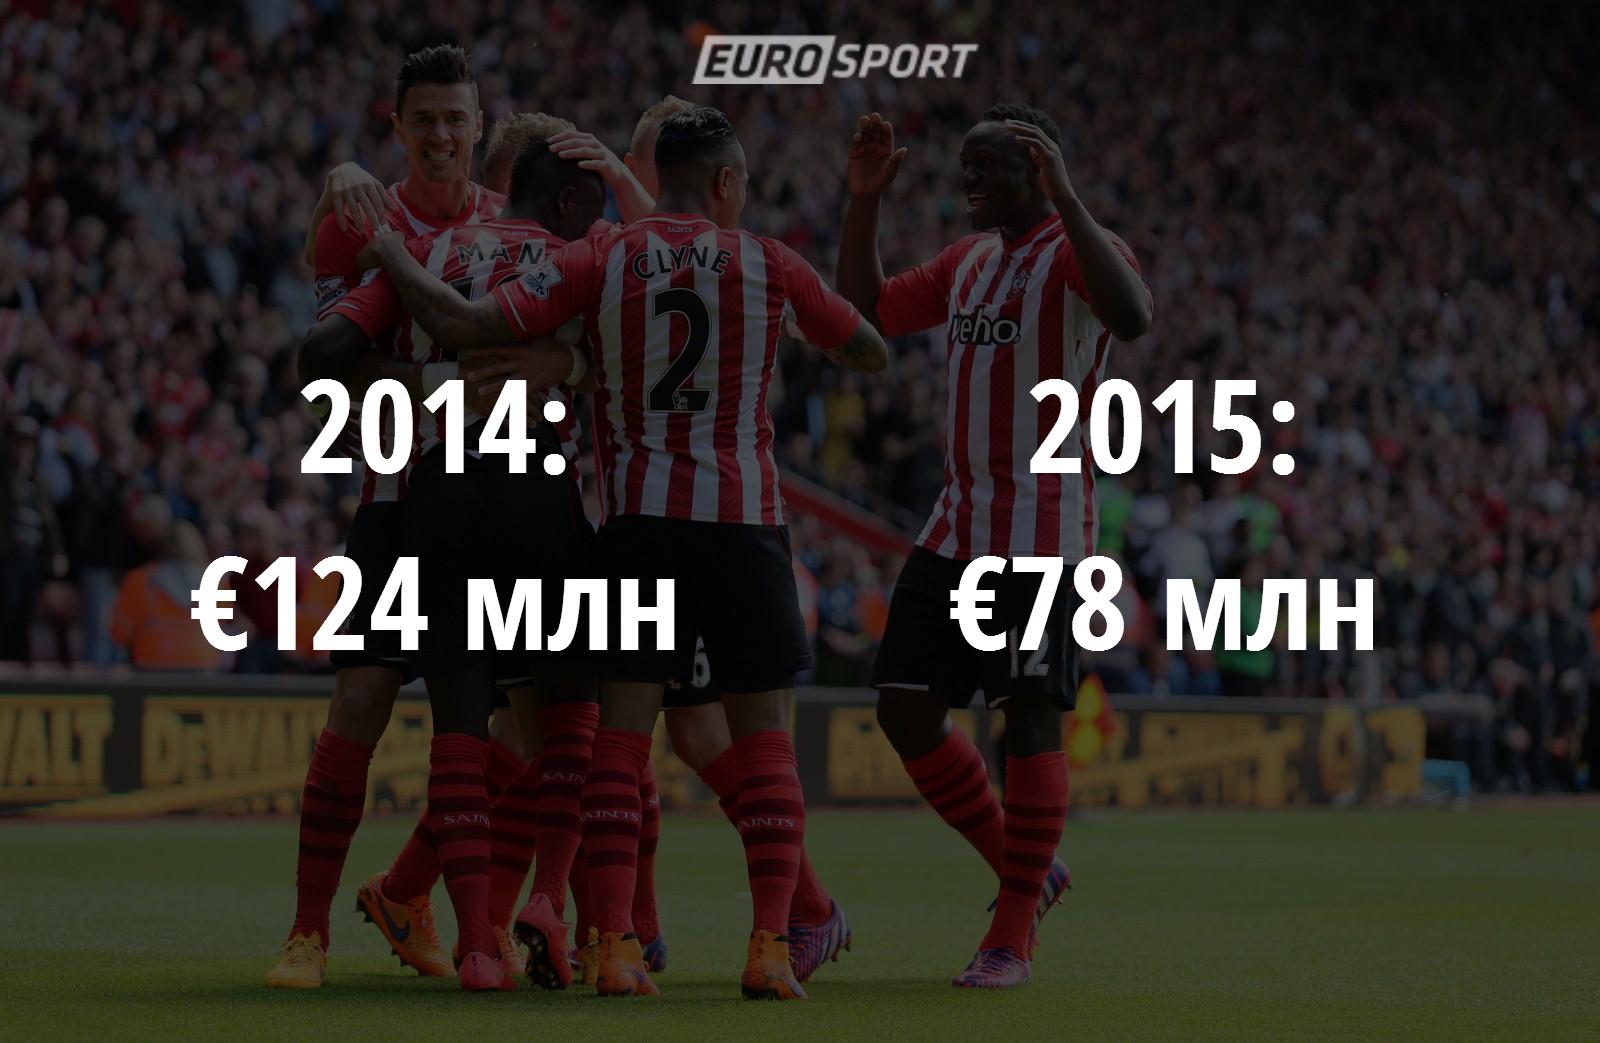 https://i.eurosport.com/2015/05/21/1564142.jpg